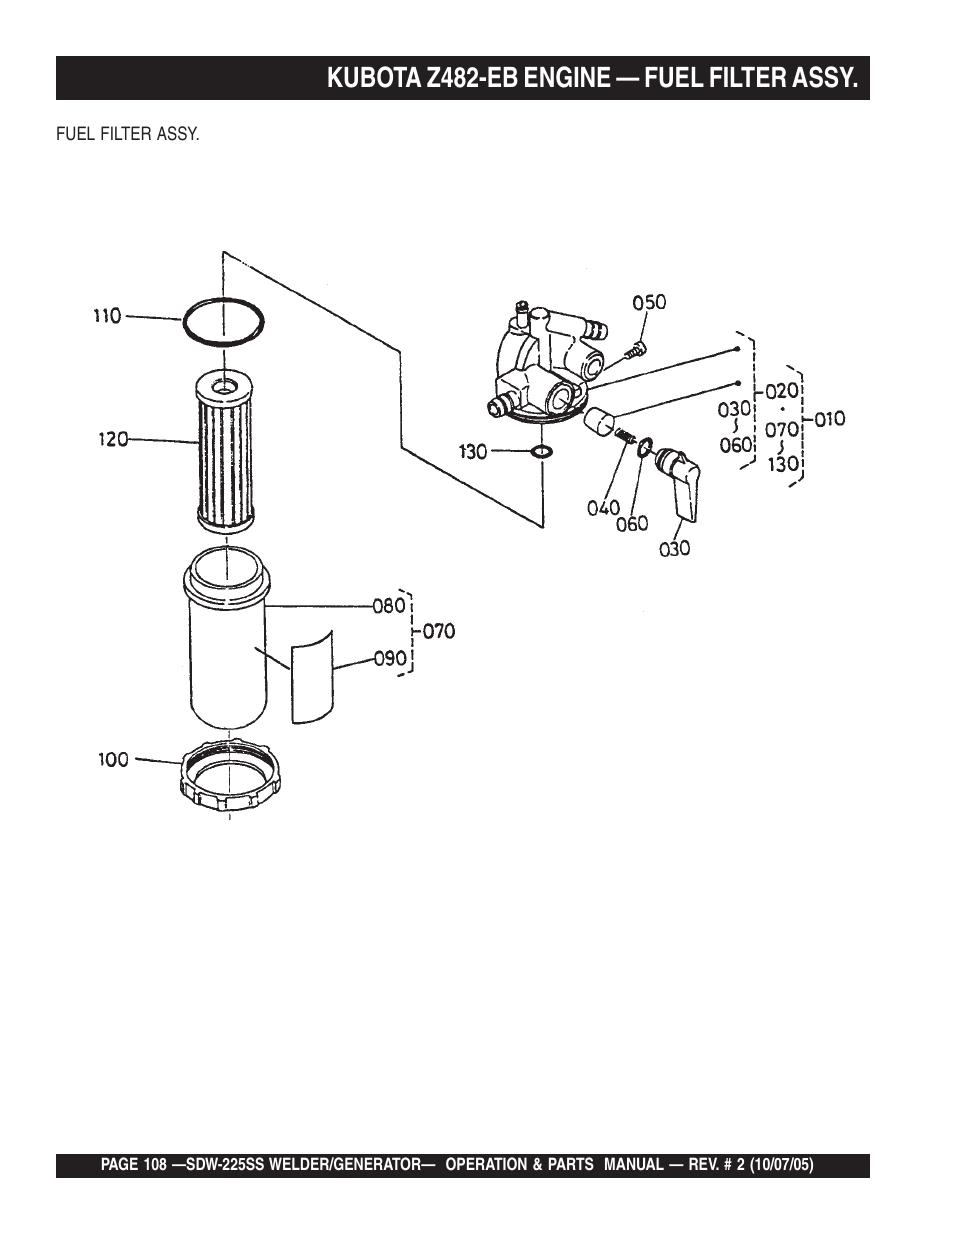 medium resolution of kubota z482 eb engine fuel filter assy multiquip sdw225ss user manual page 108 146